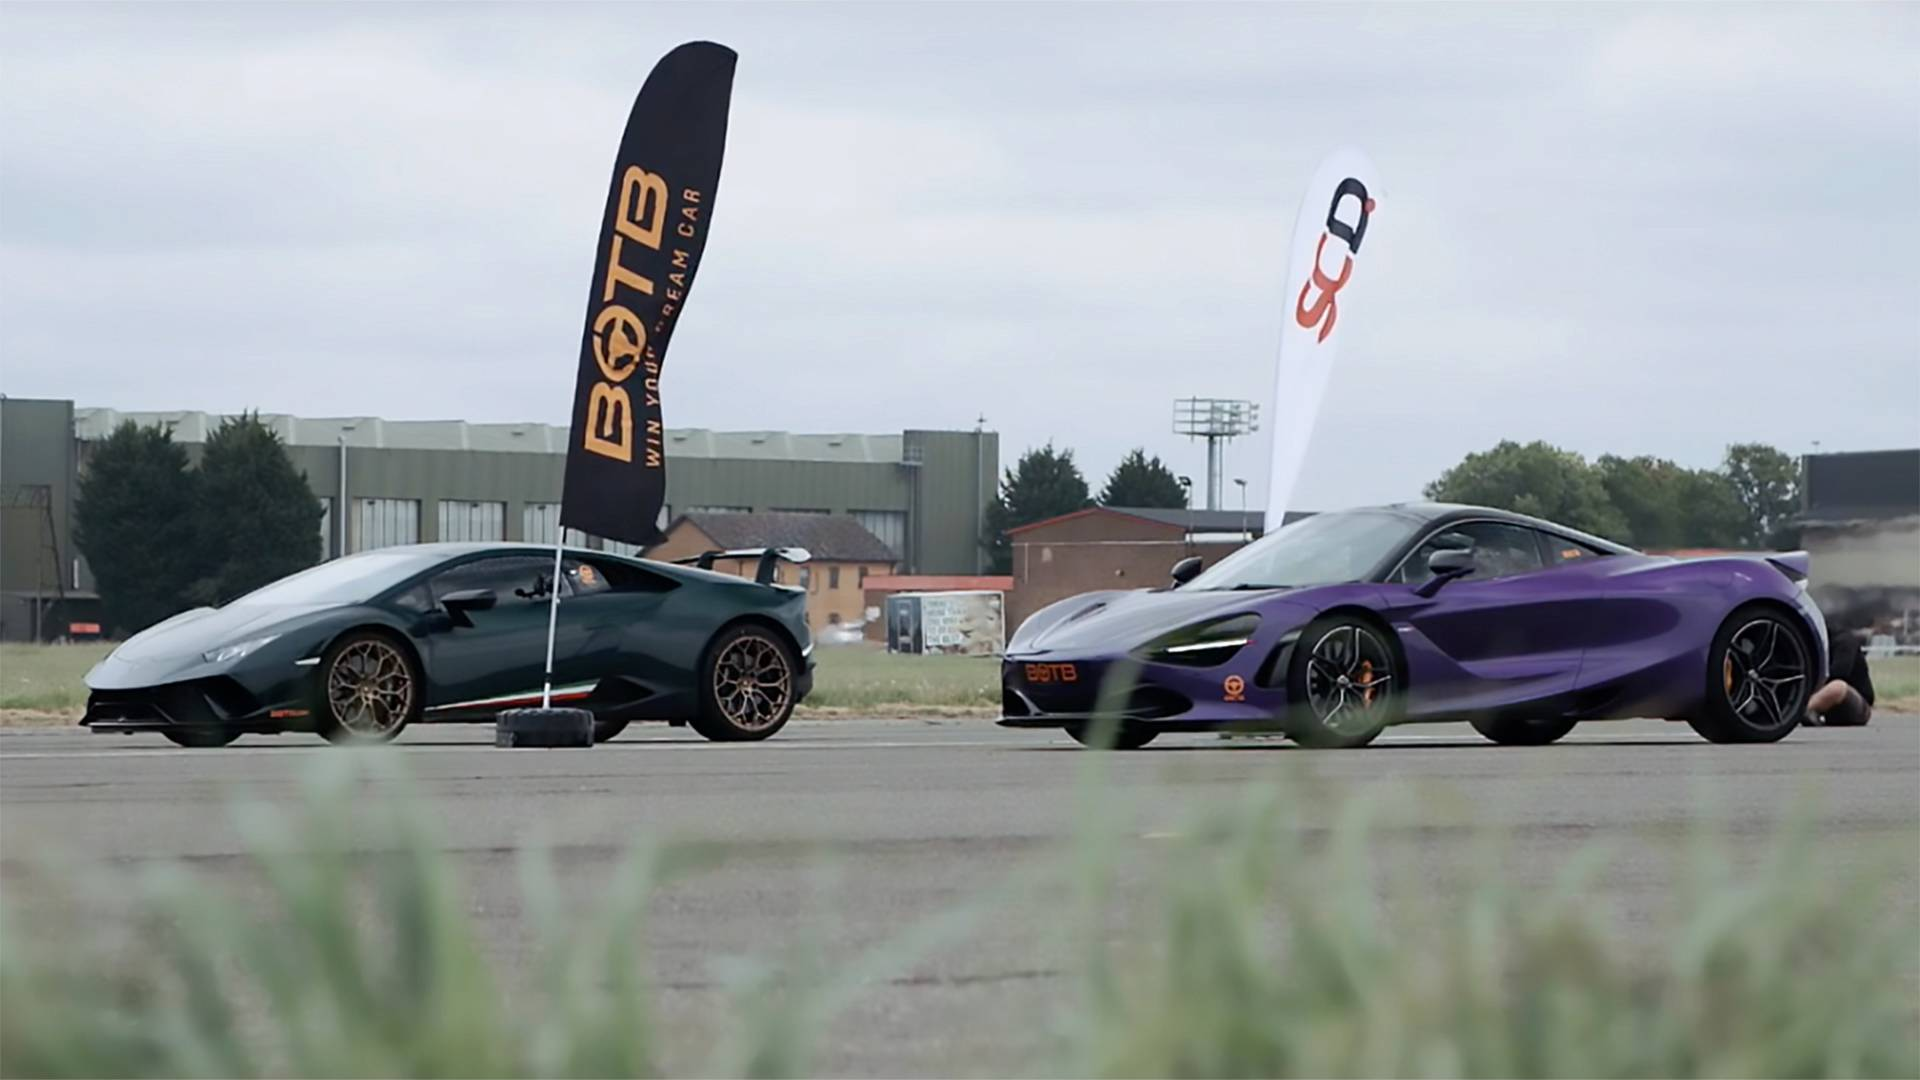 630 Hp Lamborghini Huracan Drag Races A 710 Hp Mclaren 720s